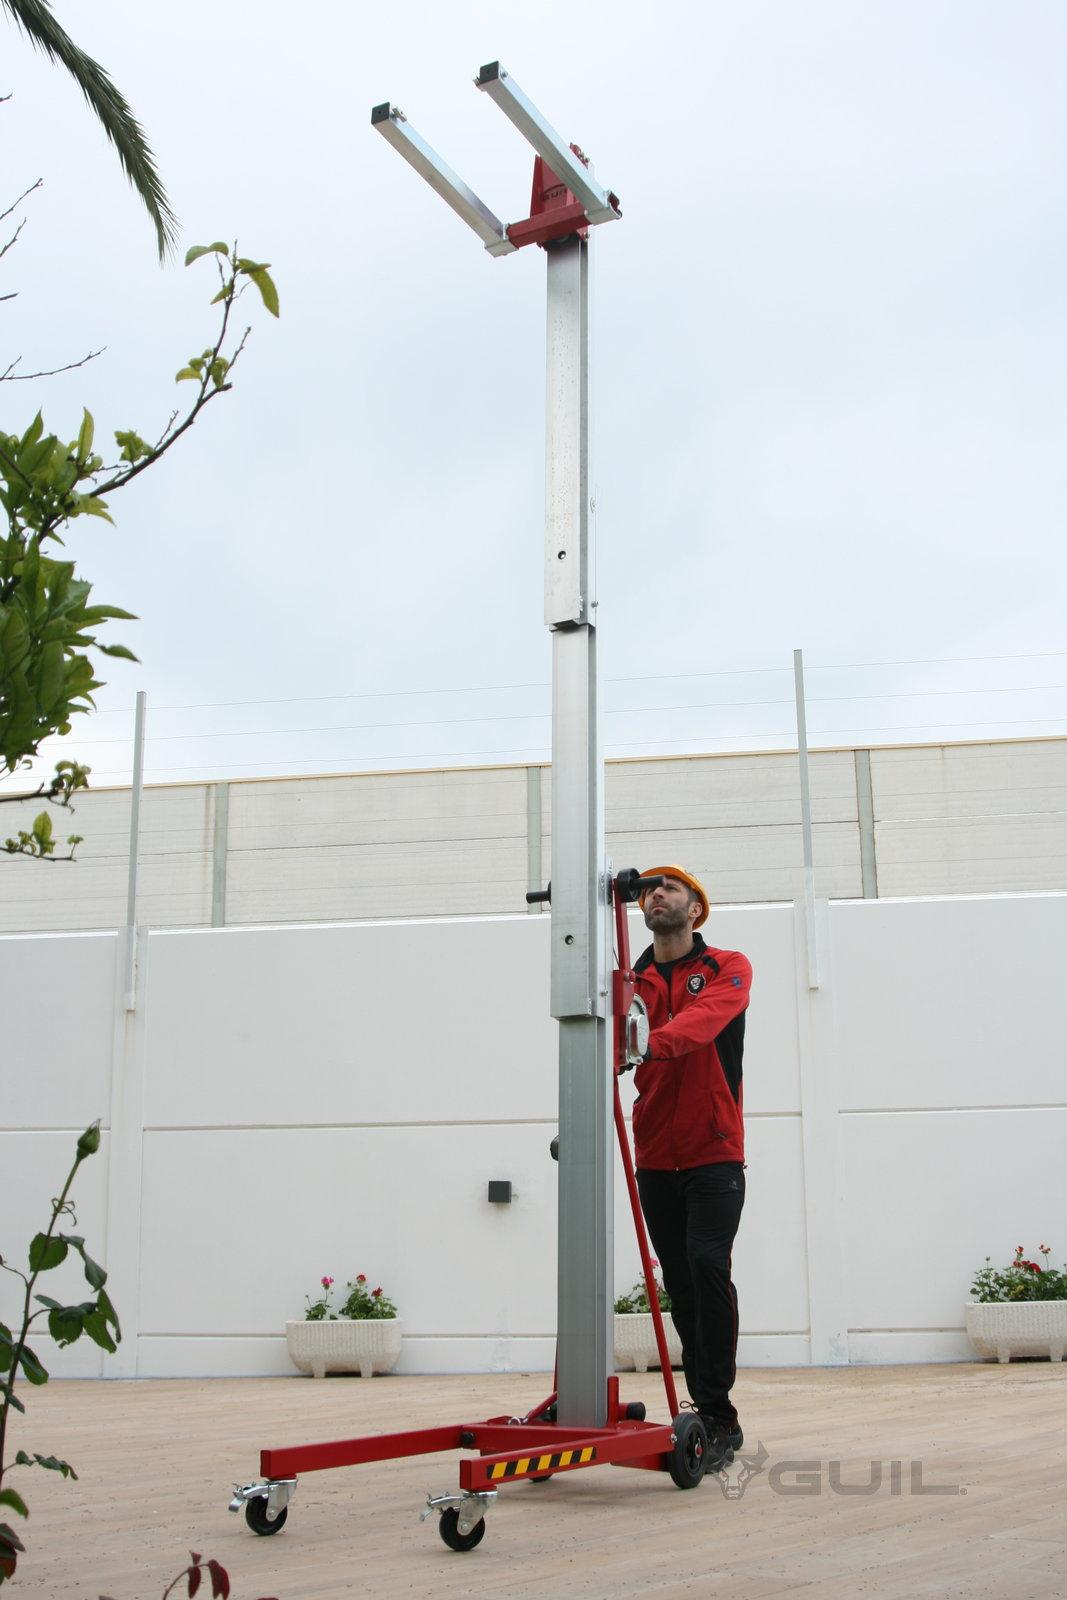 Kanaallift 2,90 m 170 kg (dutch) (9)